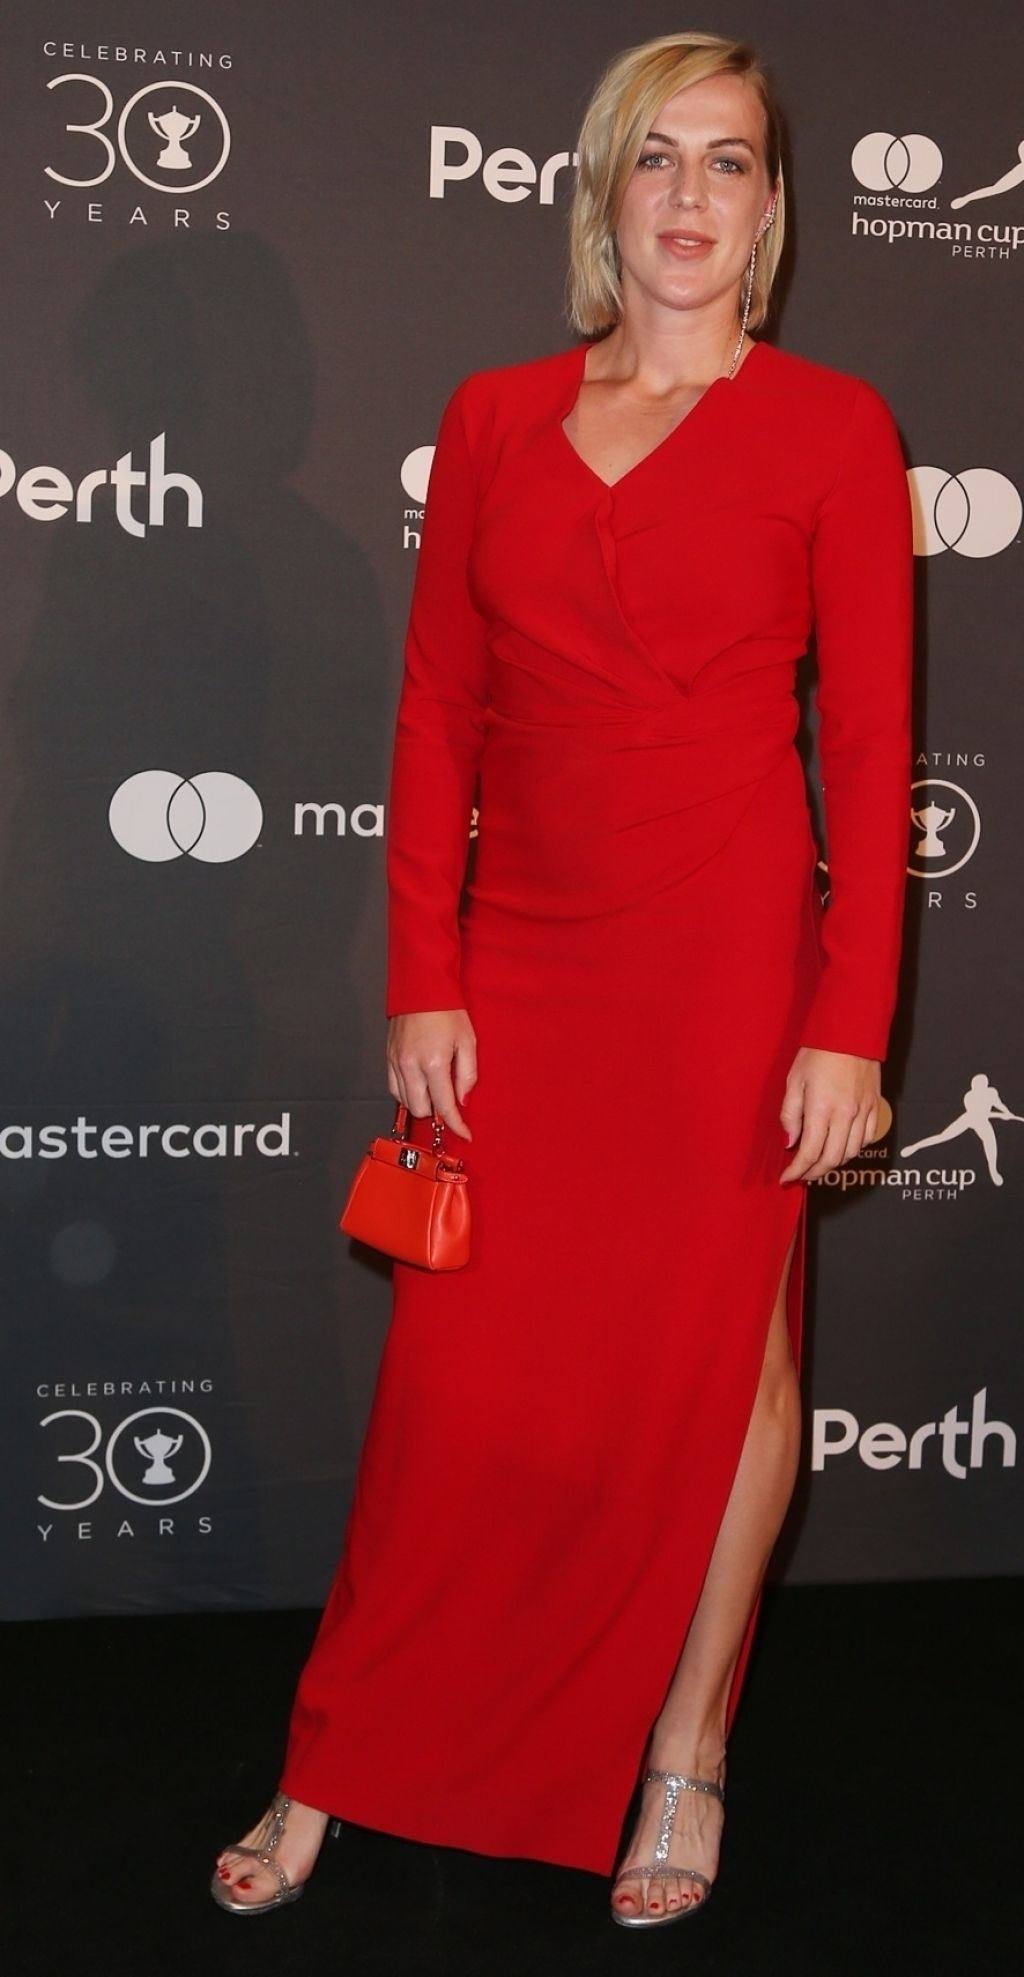 Anastasia Pavlyuchenkova at Hopman Cup New Years Eve Players Ball in Perth